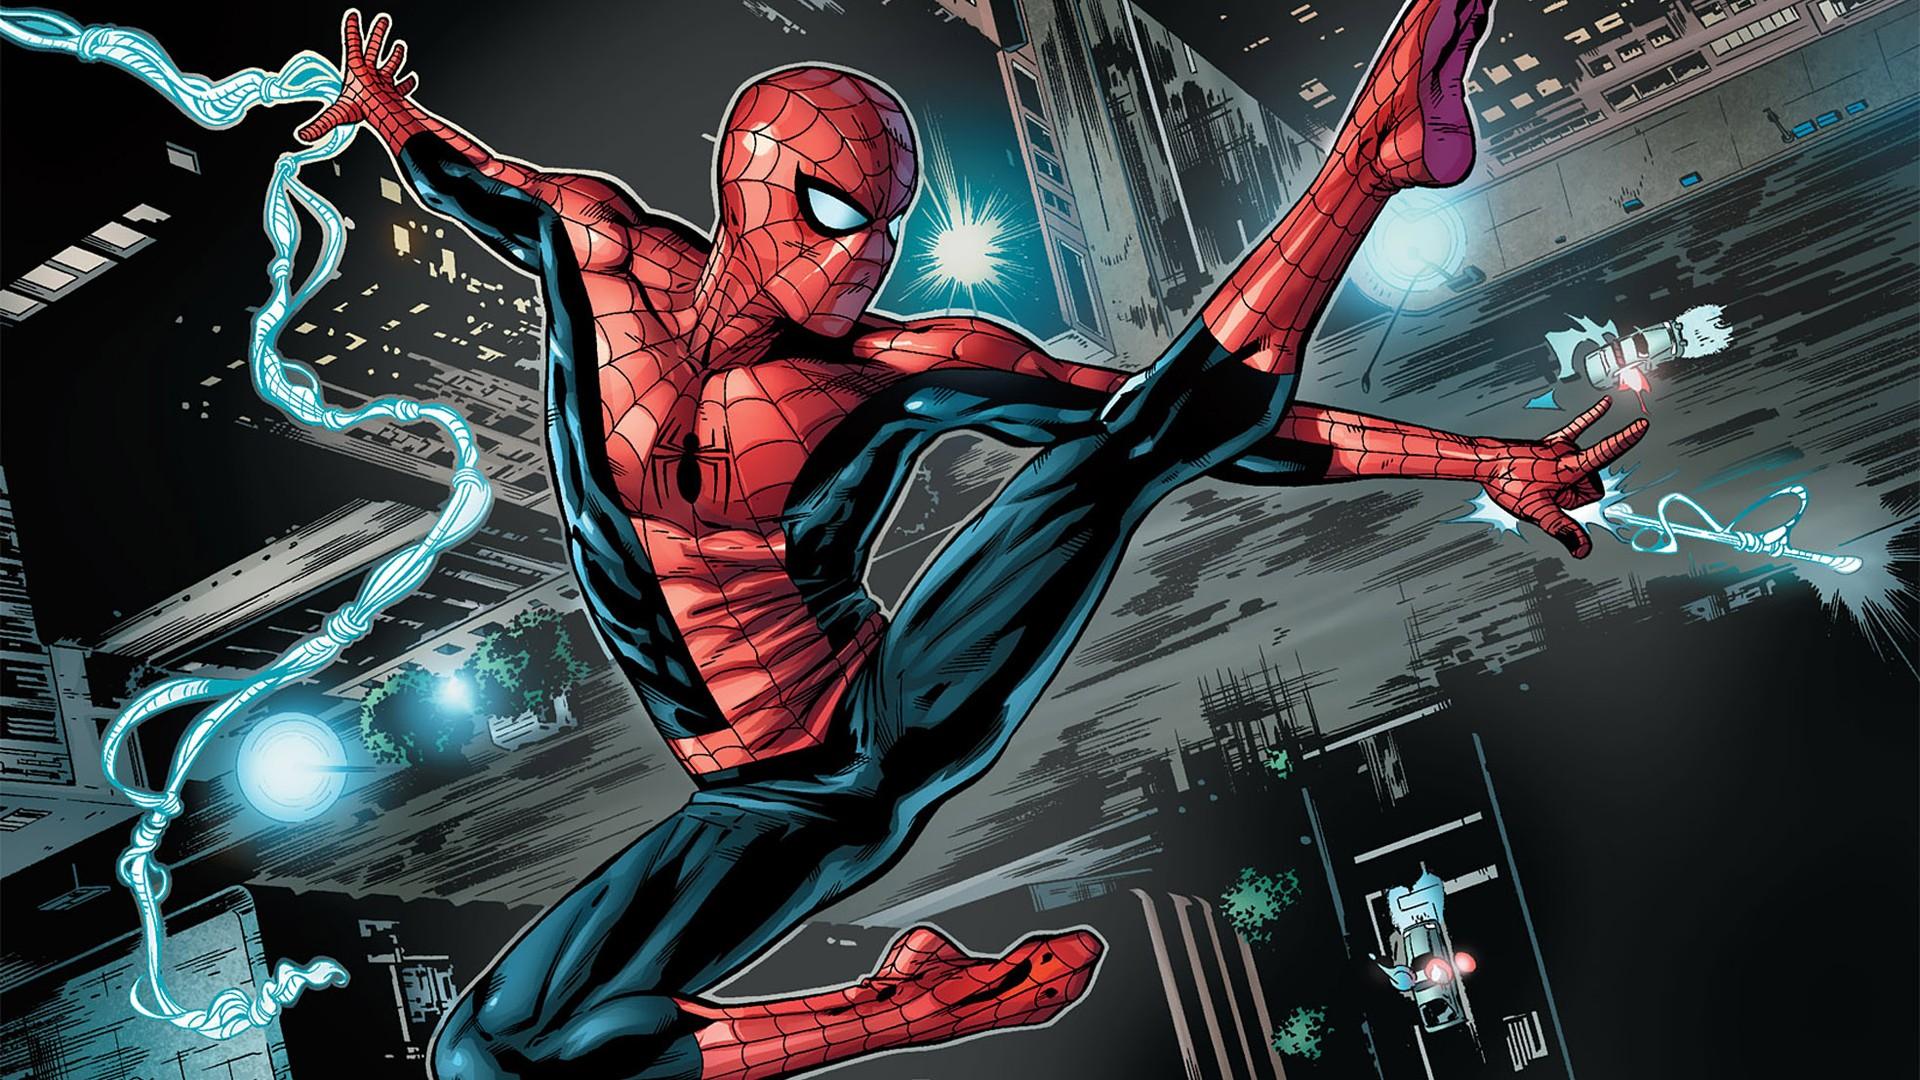 10 Best Spider Man 2099 Wallpaper Hd Full Hd 1920 1080 For: Spiderman Wallpaper 19